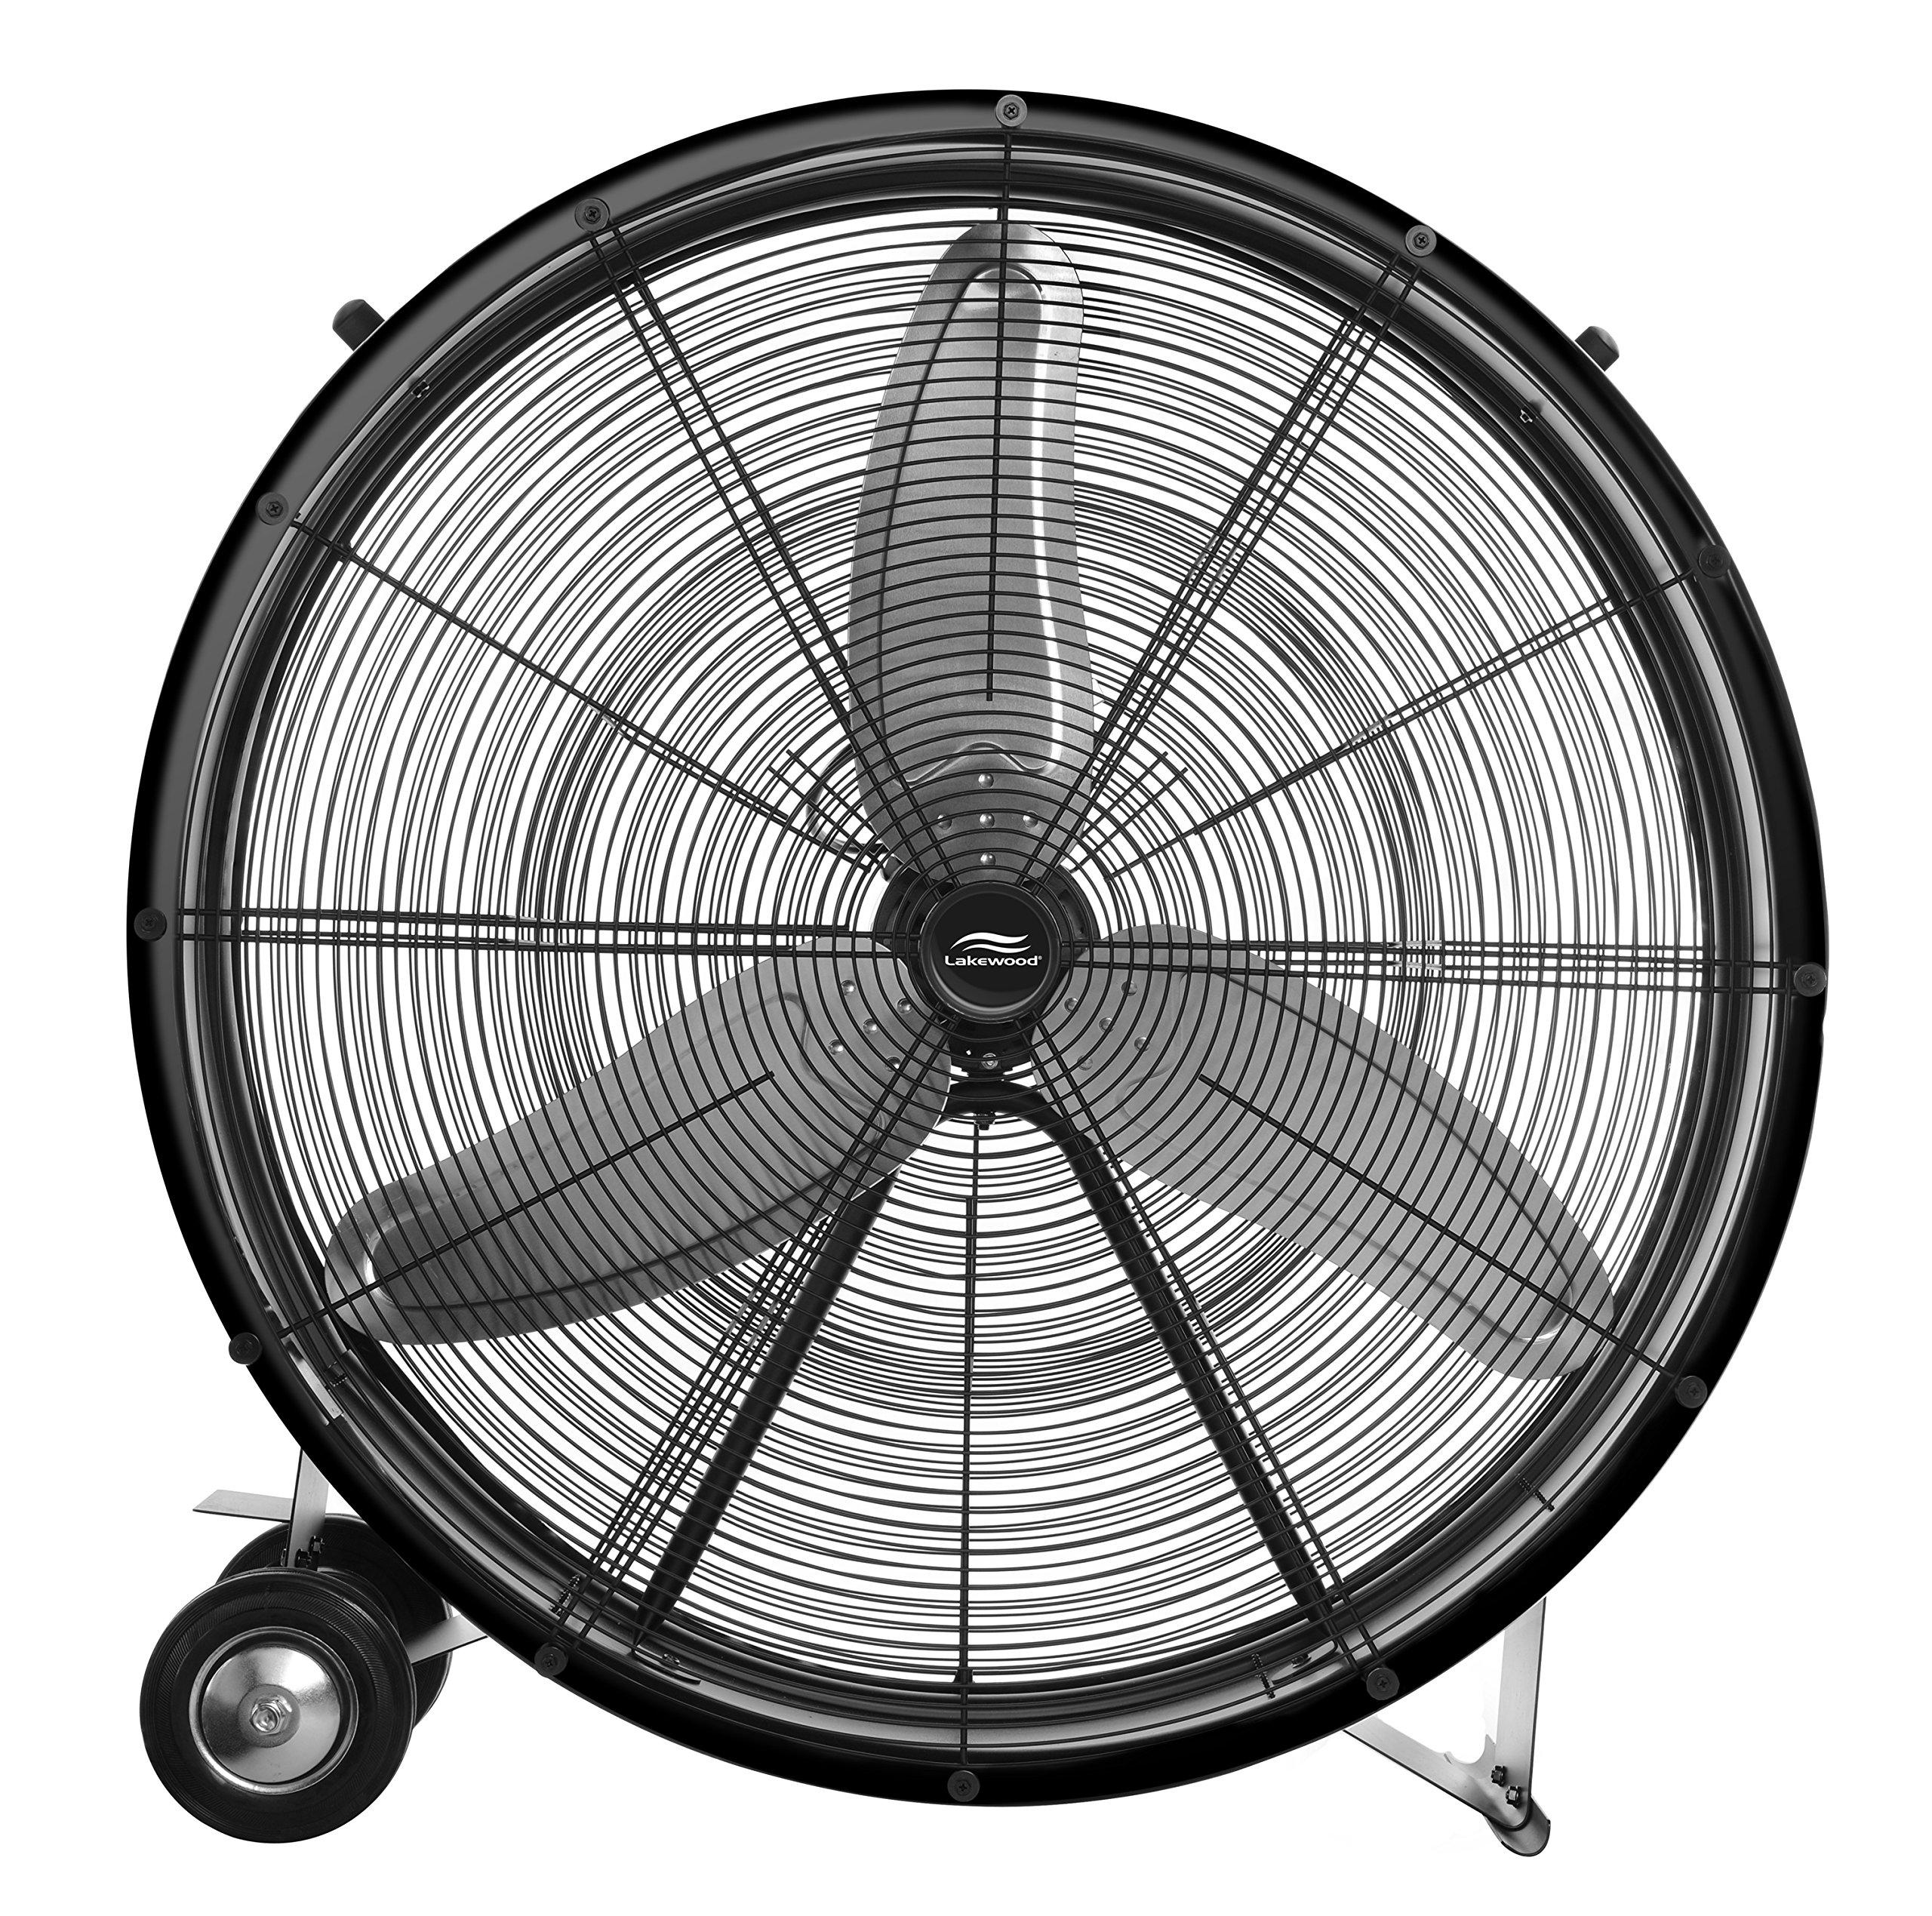 Lakewood 36-Inch Industrial Grade Drum Fan by Lakewood